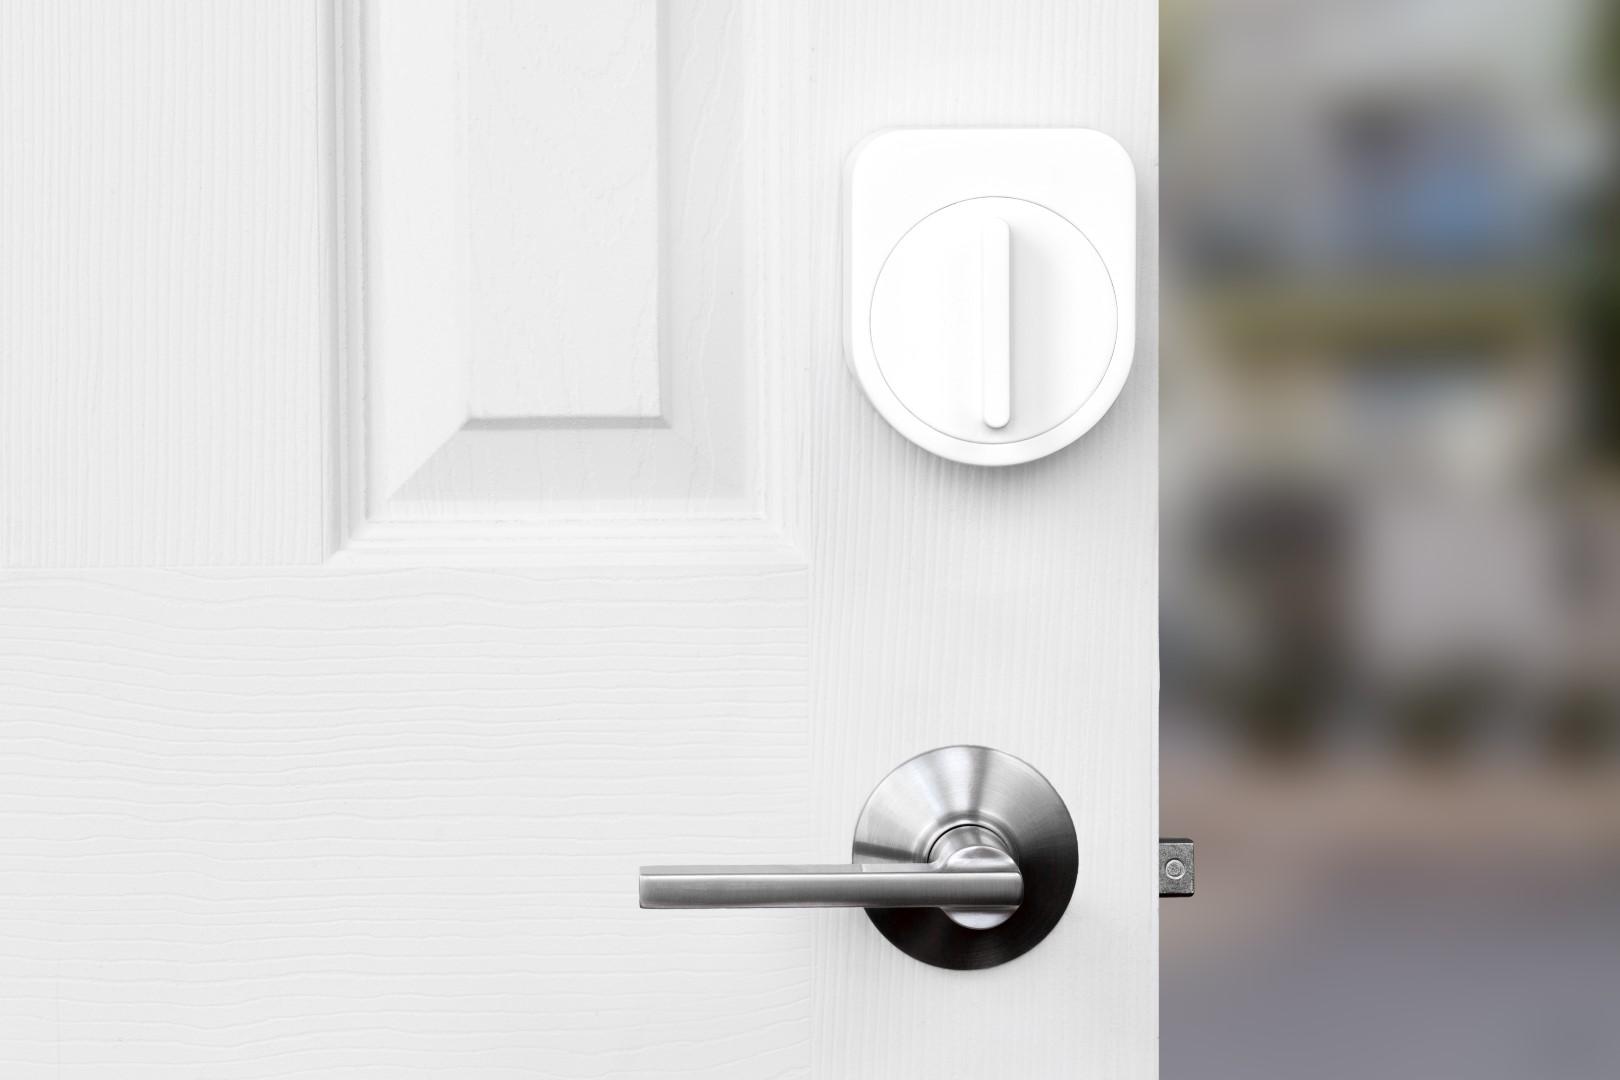 White_door (Large).jpg